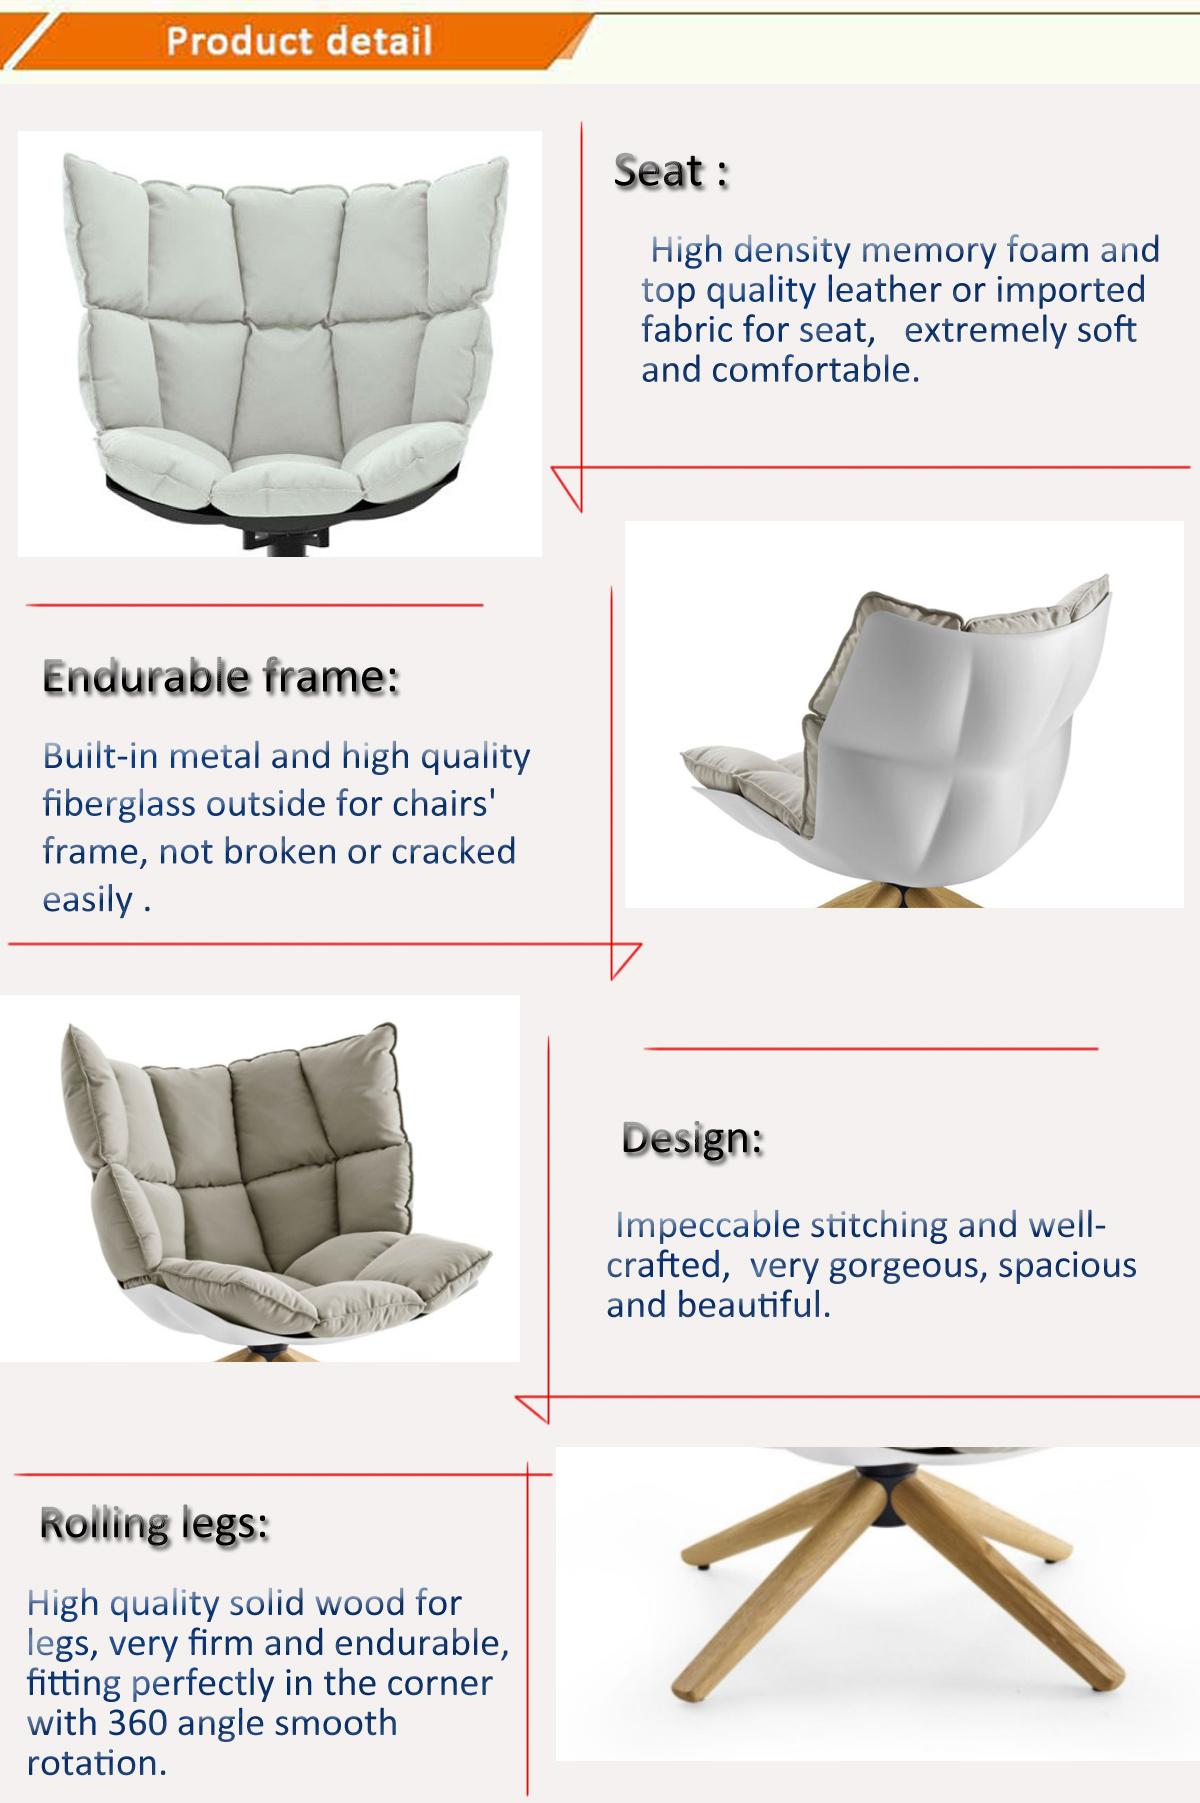 Diseño único de lujo tela tapizada de madera maciza piernas muebles de diseño interior giratoria Marco de fibra de vidrio comedor cáscara silla